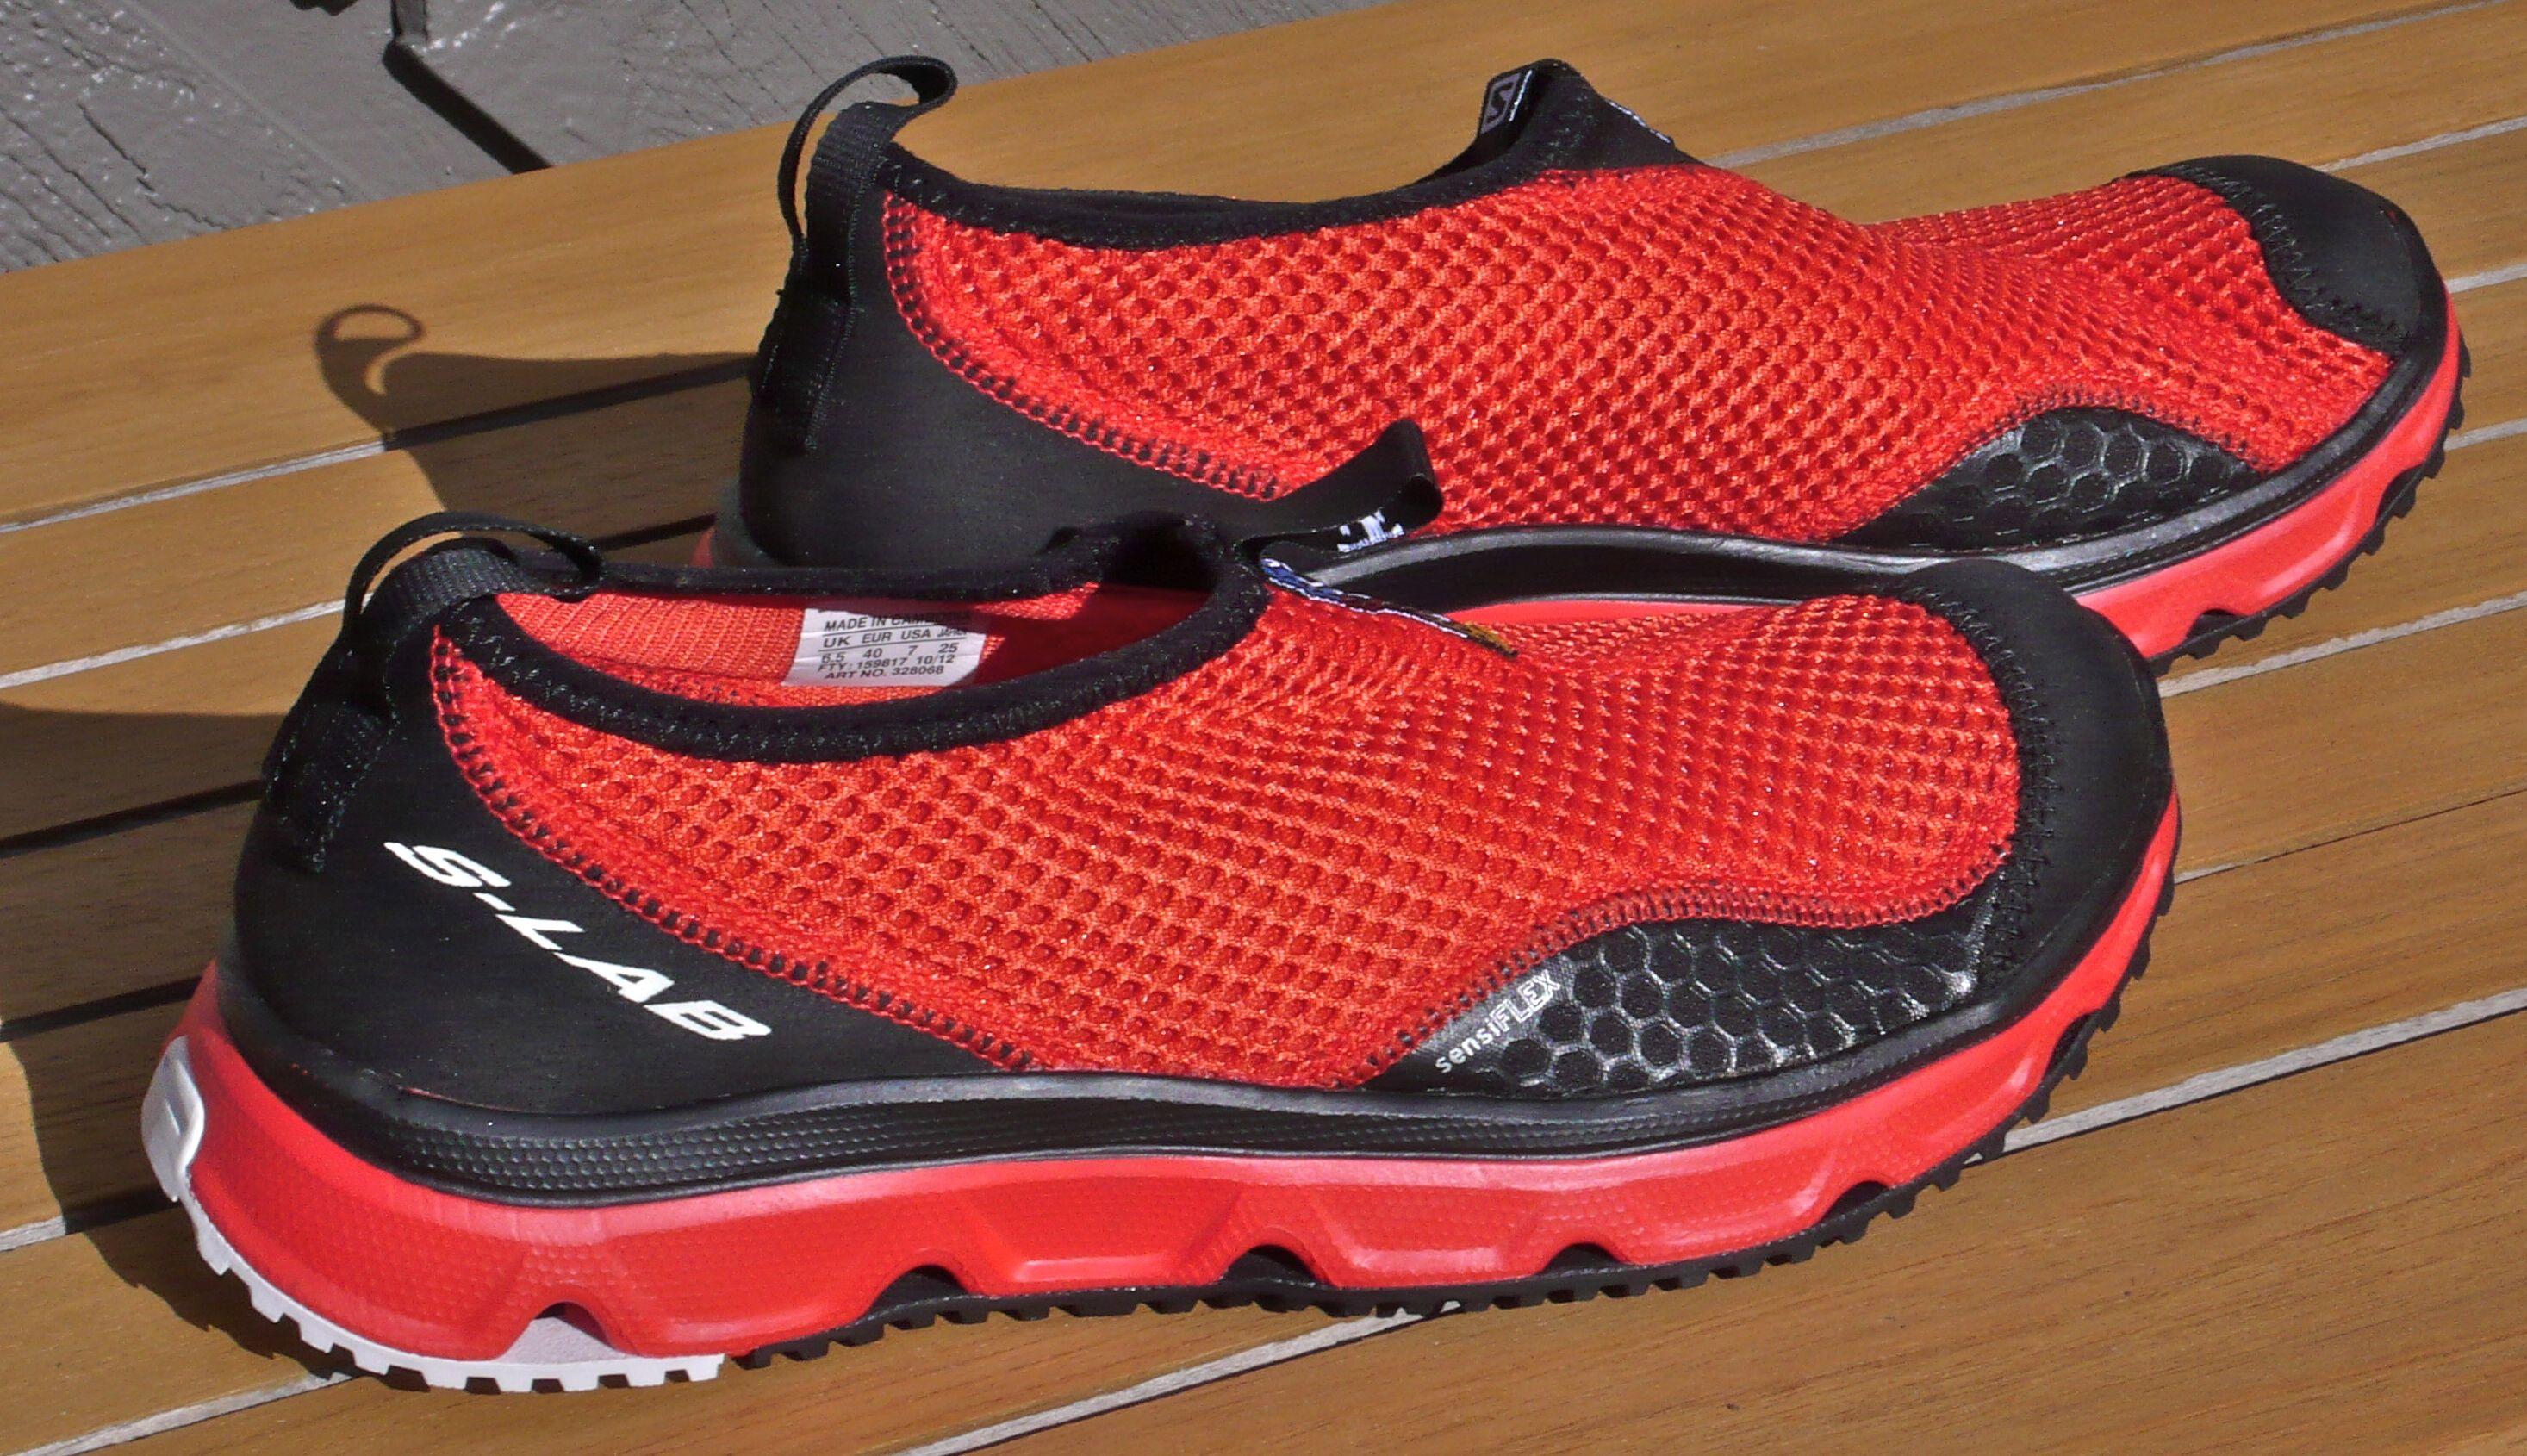 chaussures salomon recuperation